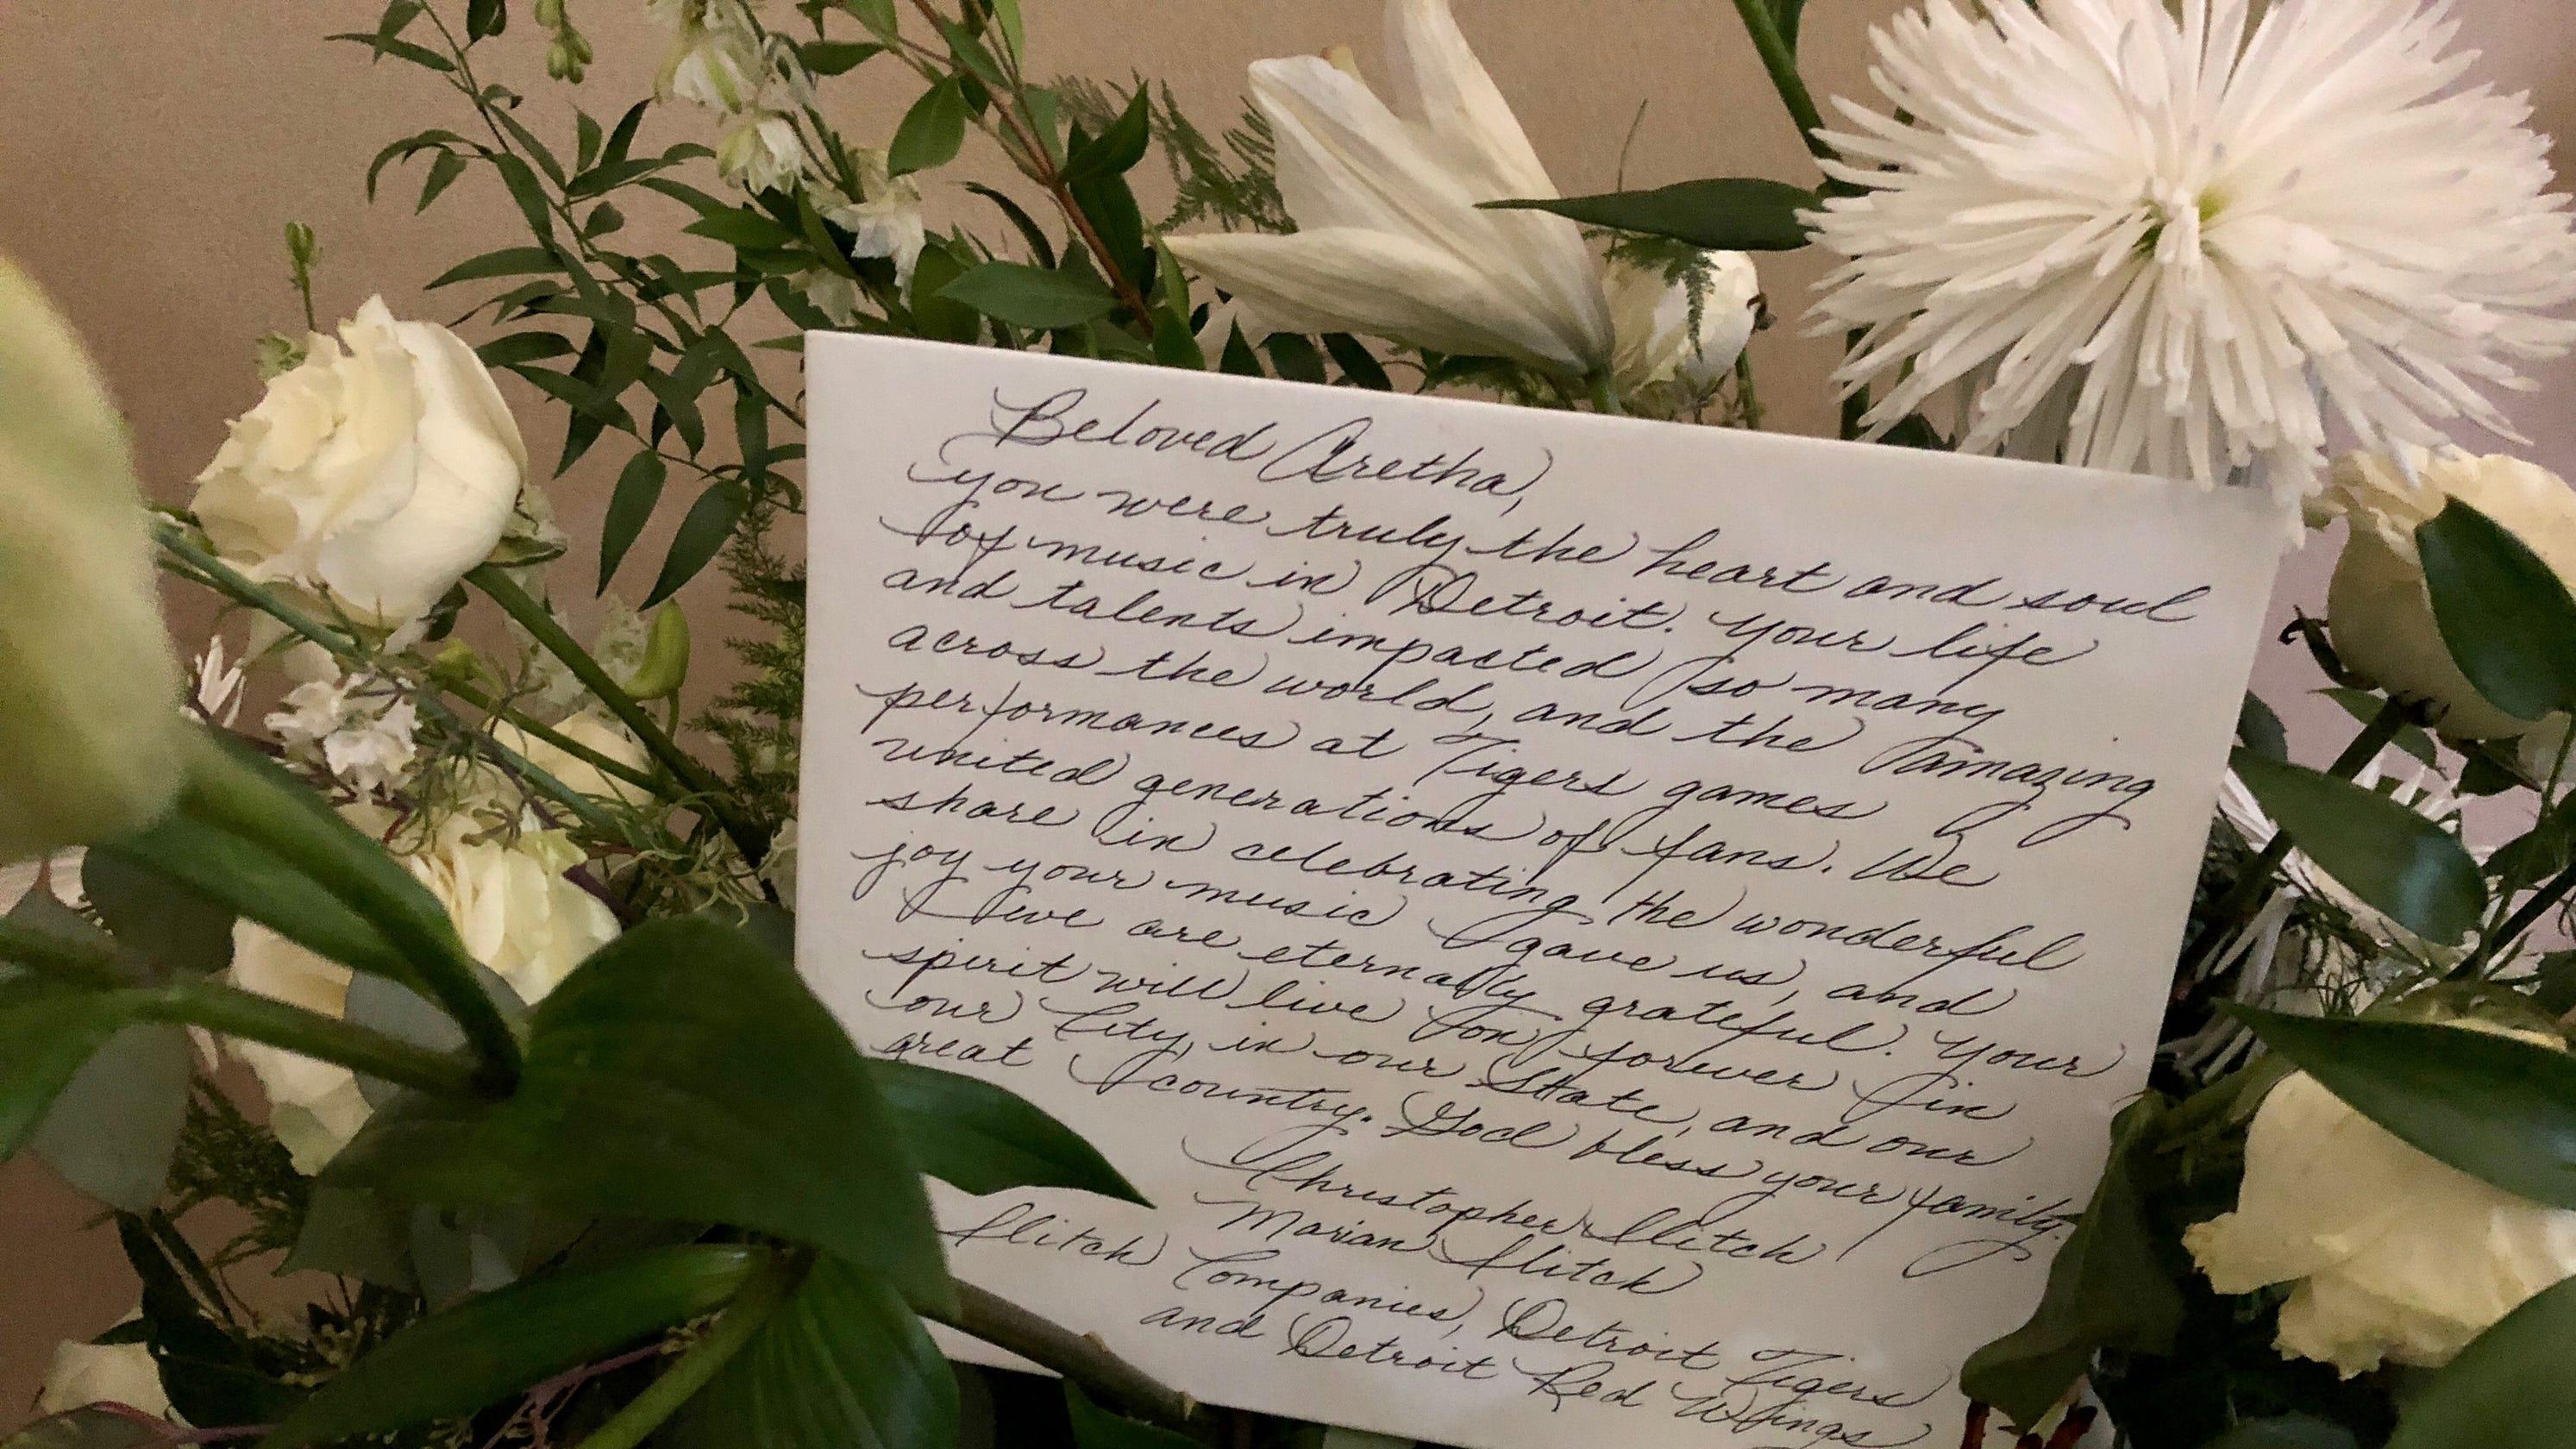 Mariah Carey Diana Ross Send Flowers For Arethas Funeral